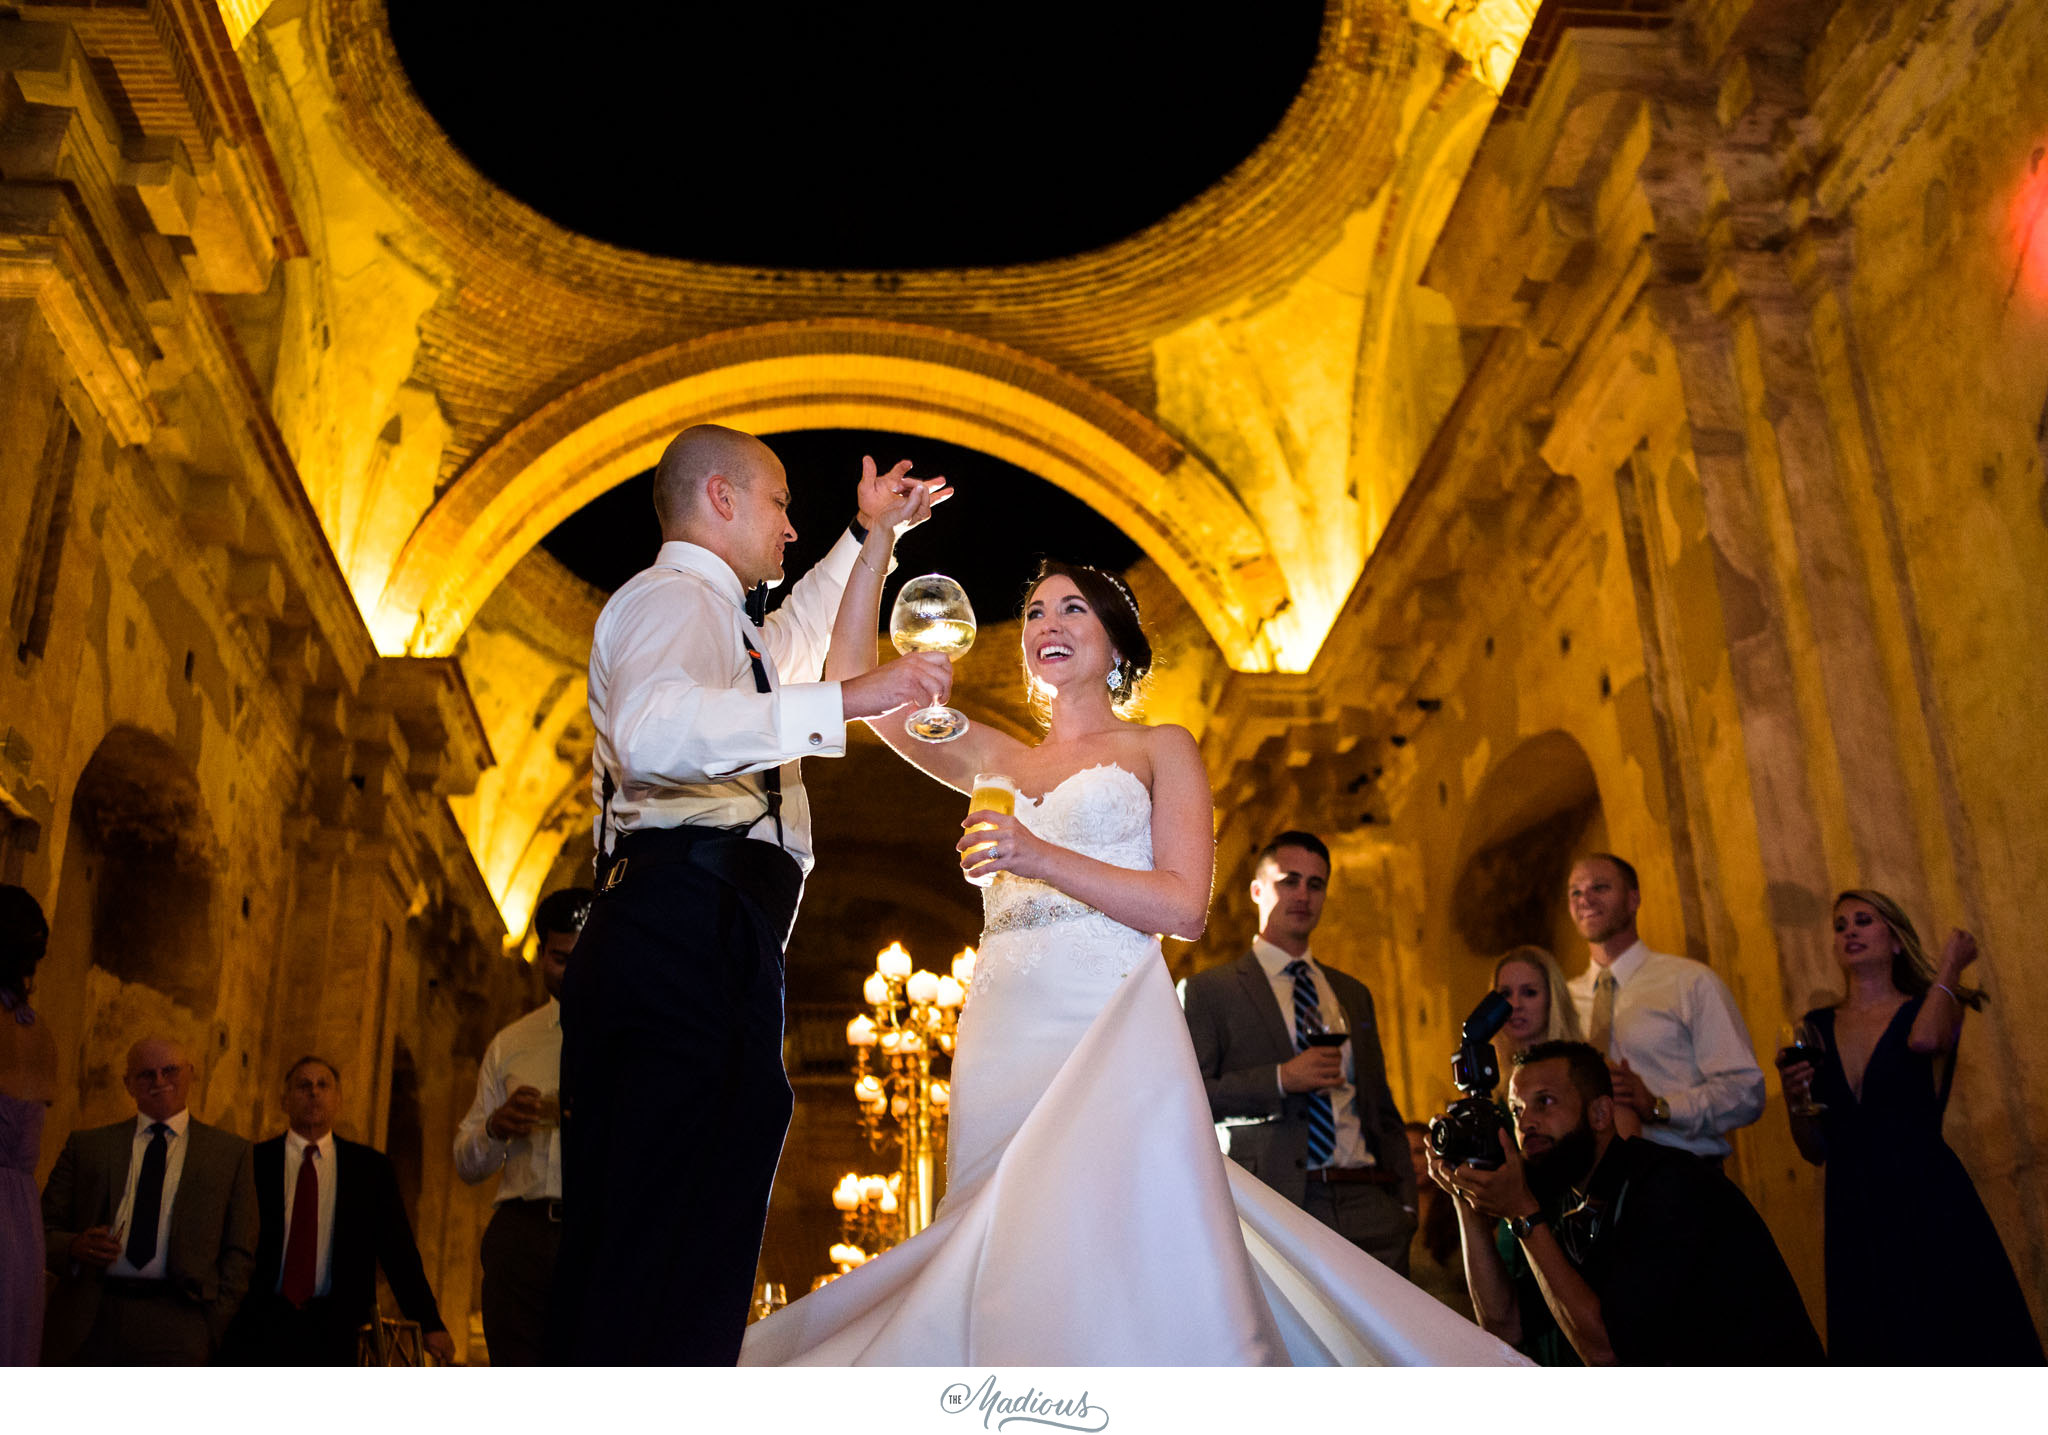 Leigh_Rob_Antigua_Guatemala_Santa_Clara_Destination_Wedding_60.JPG